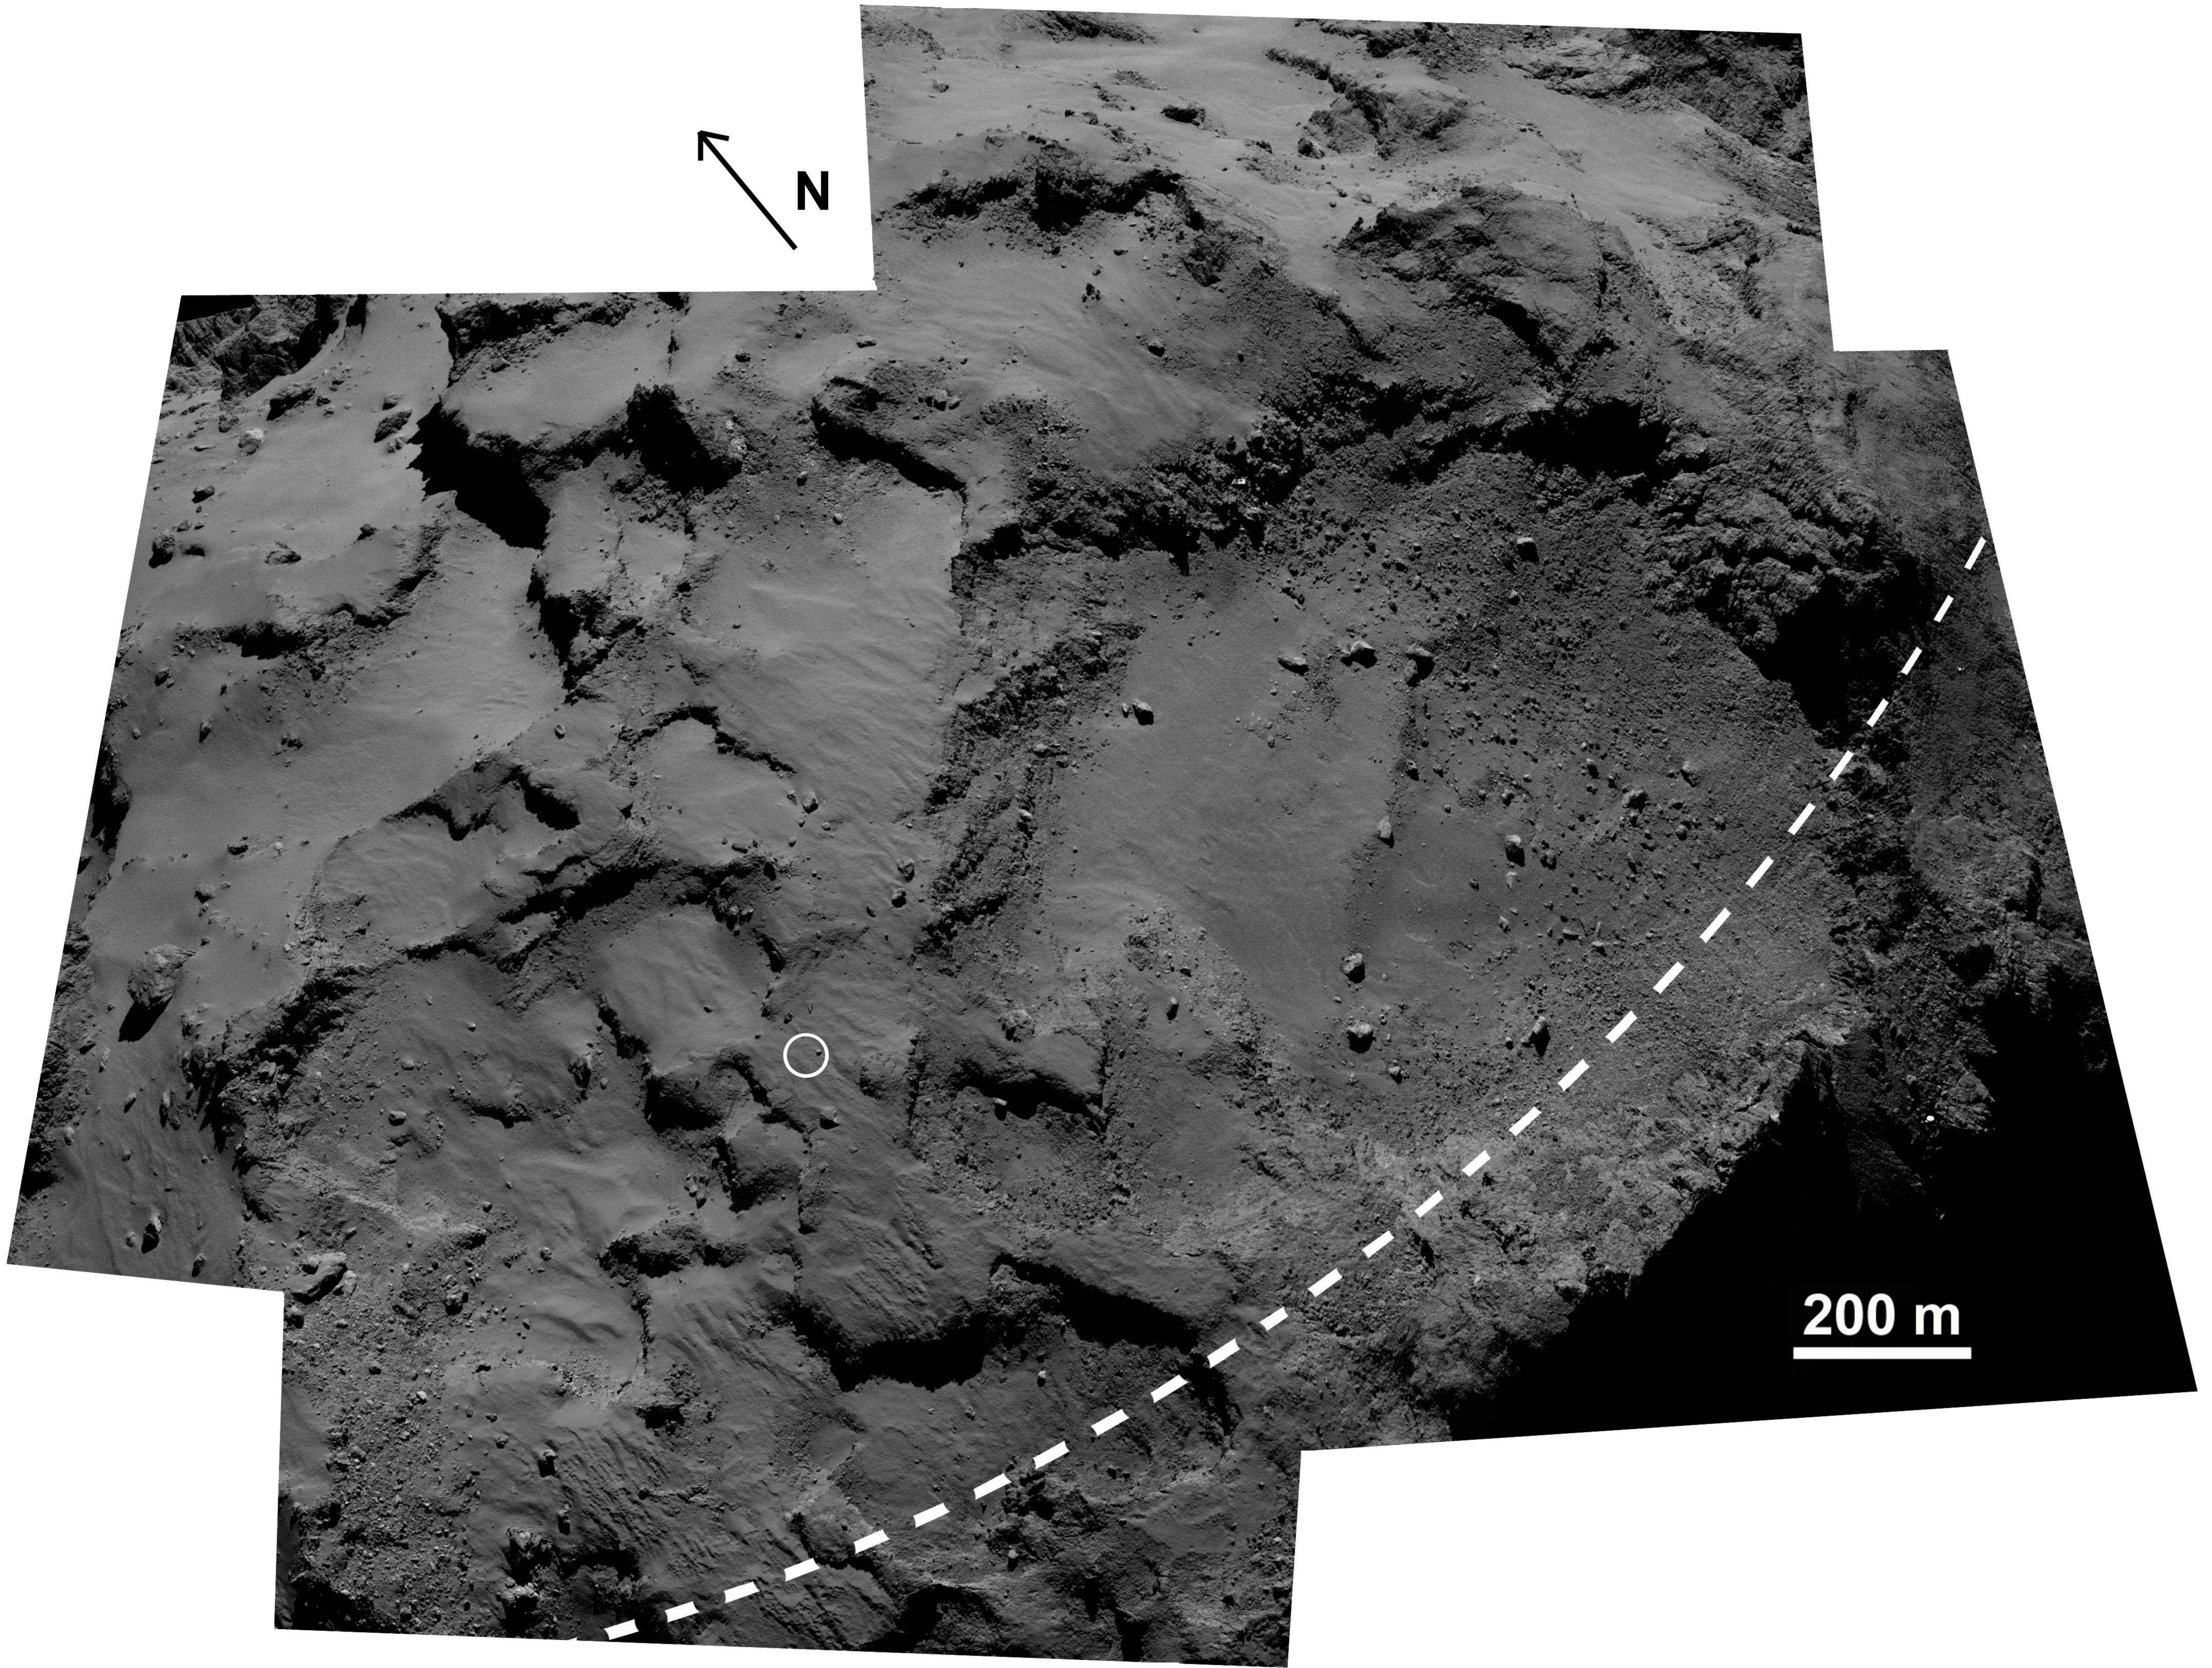 1567215592430-Rosetta_OSIRIS_Agilkia_LaForgia_Fig2_4k.jpg